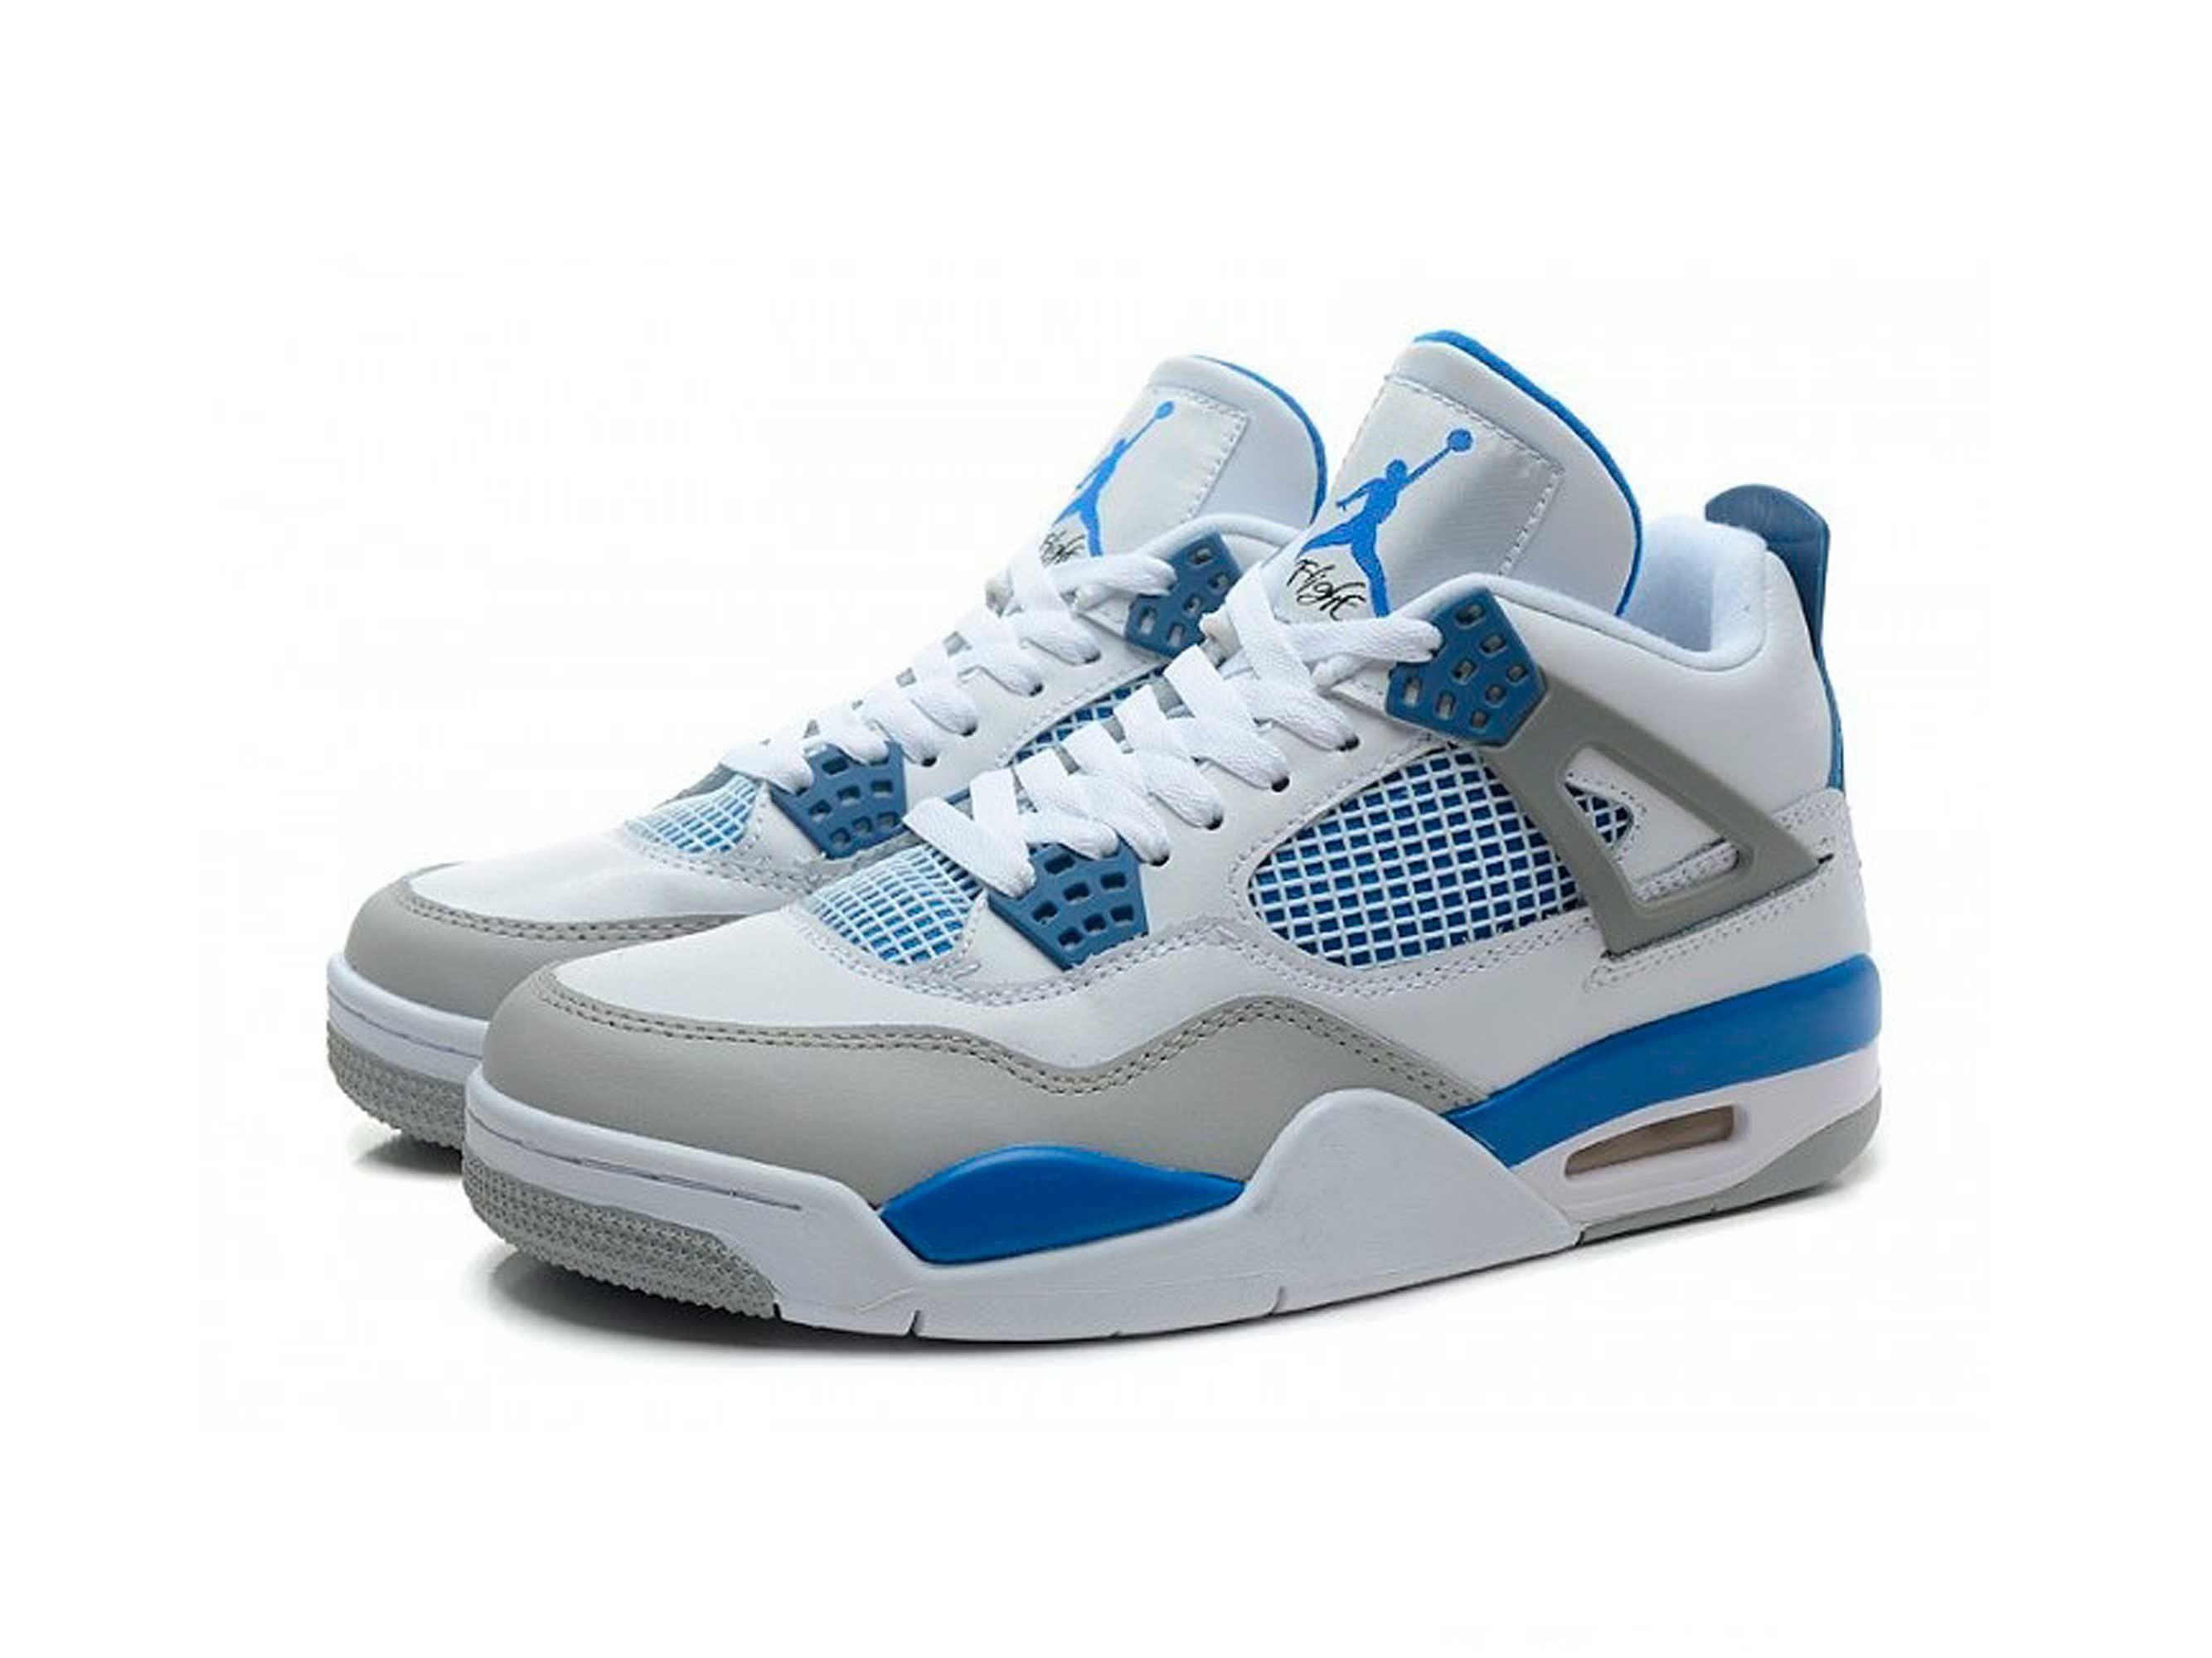 nike air jordan 4 retro white military blue grey 308497-105 интернет магазин